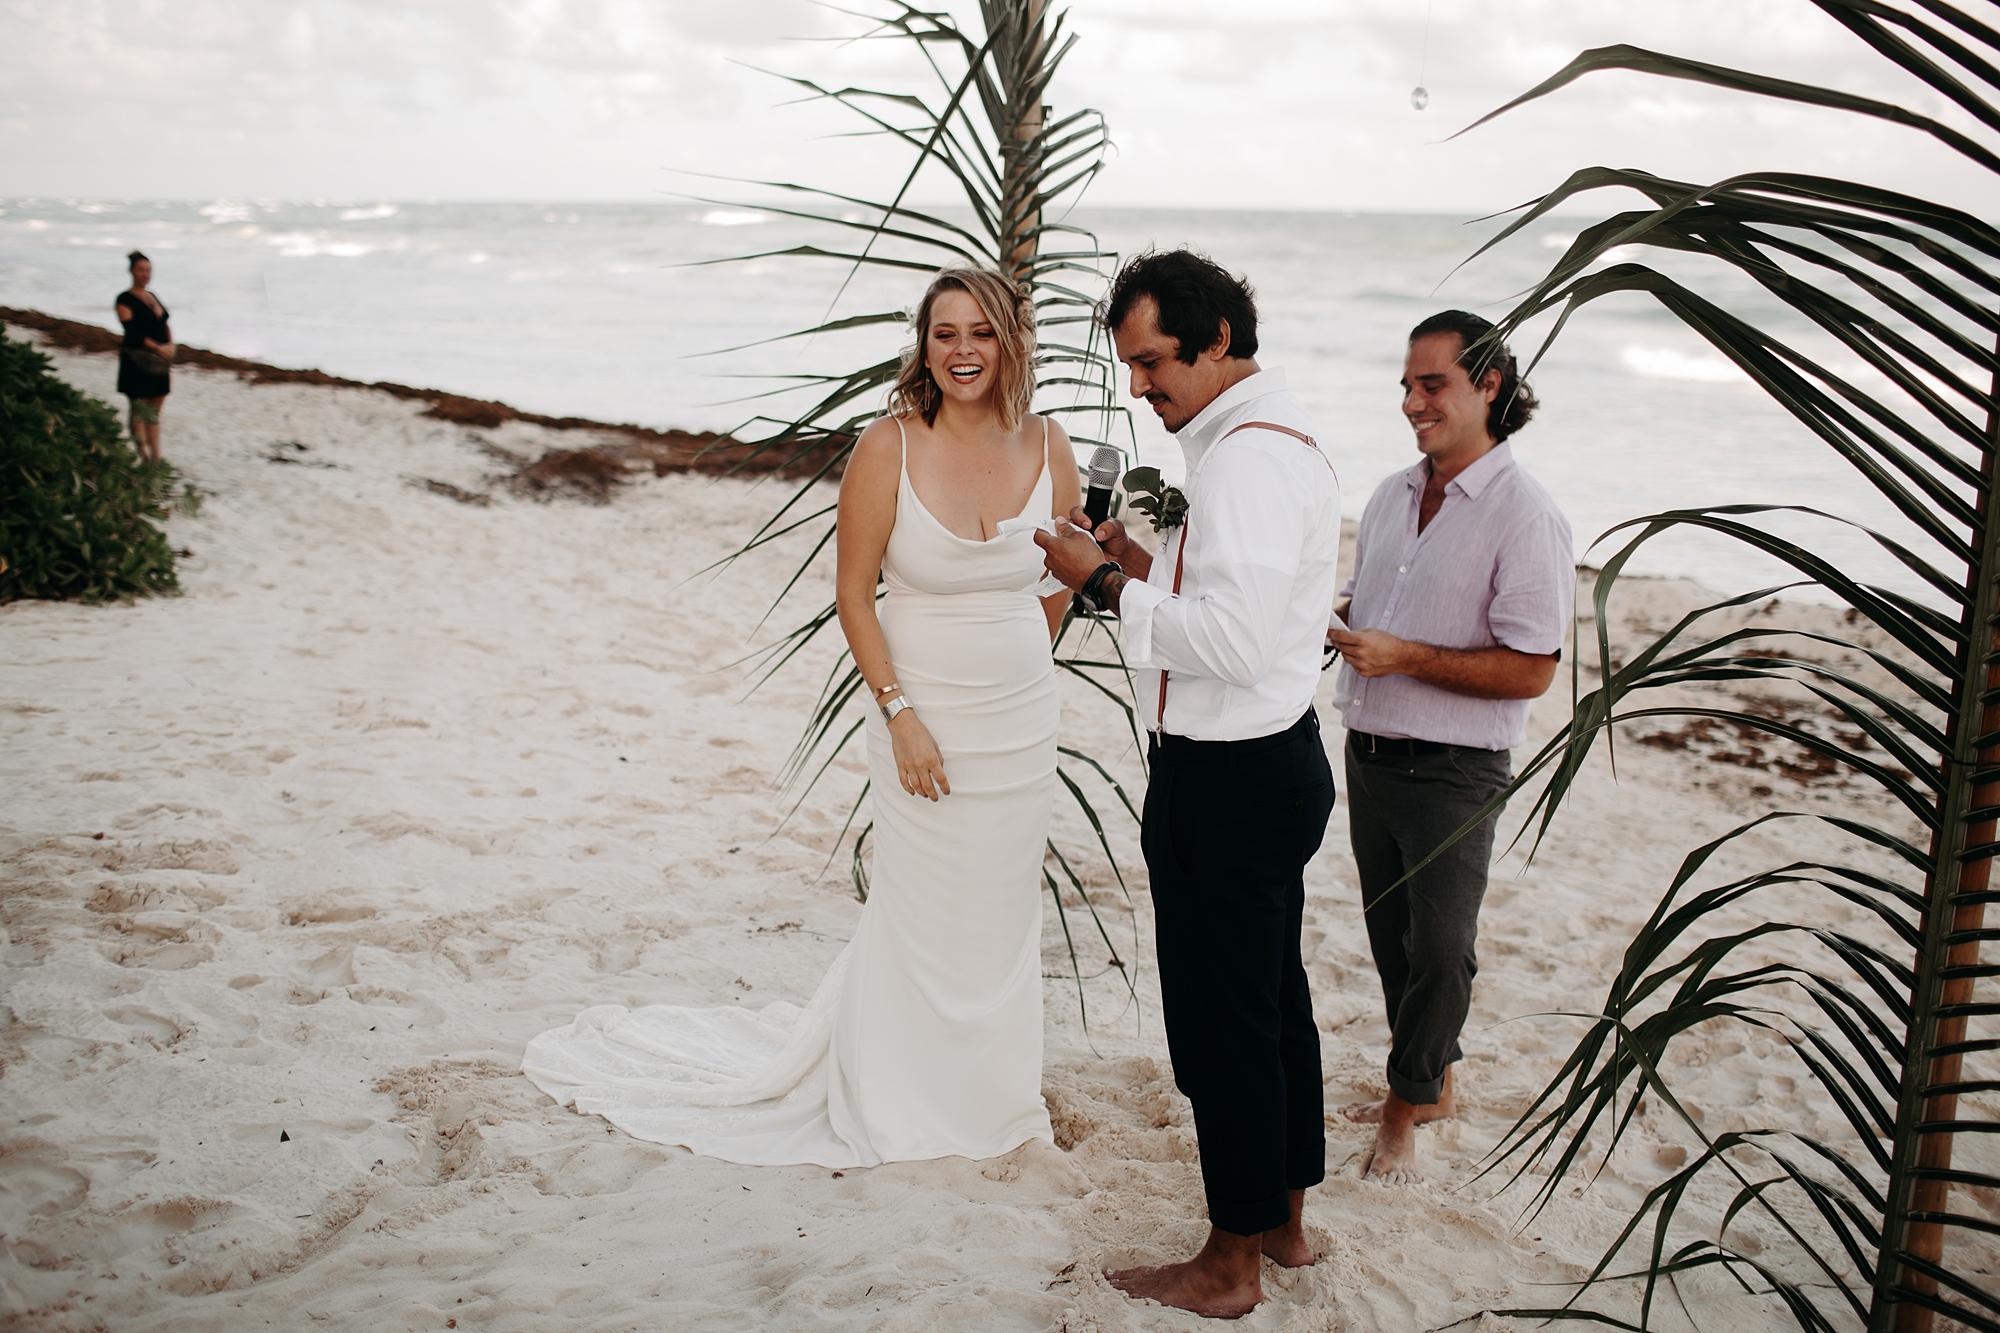 Danielle-San-Antonio-Wedding-Photographer-162_WEB.jpg